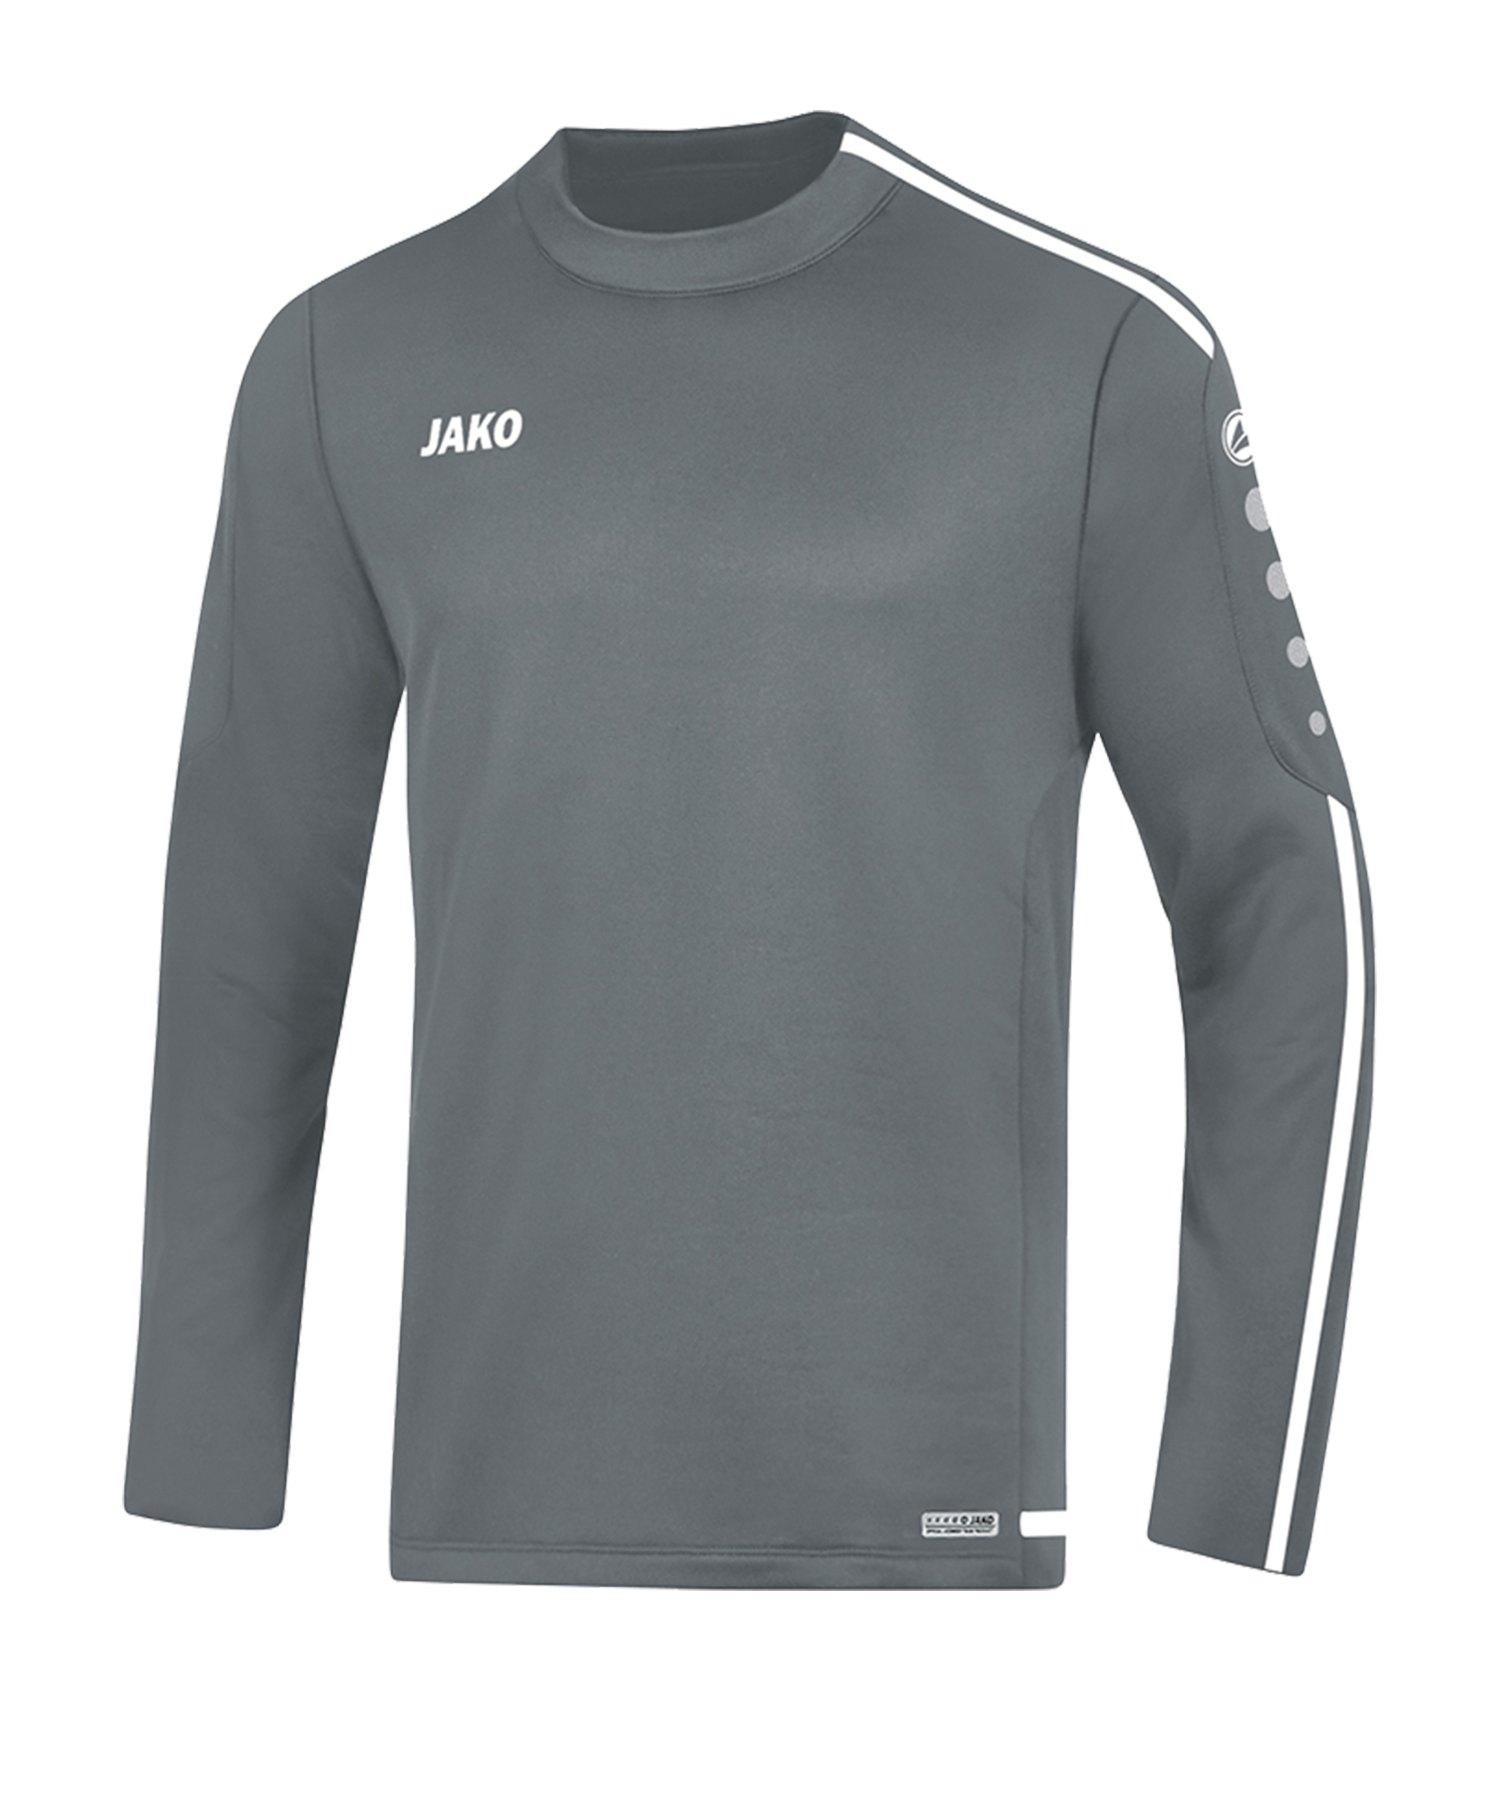 Jako Striker 2.0 Sweatshirt Kids Grau Weiss F40 - Grau